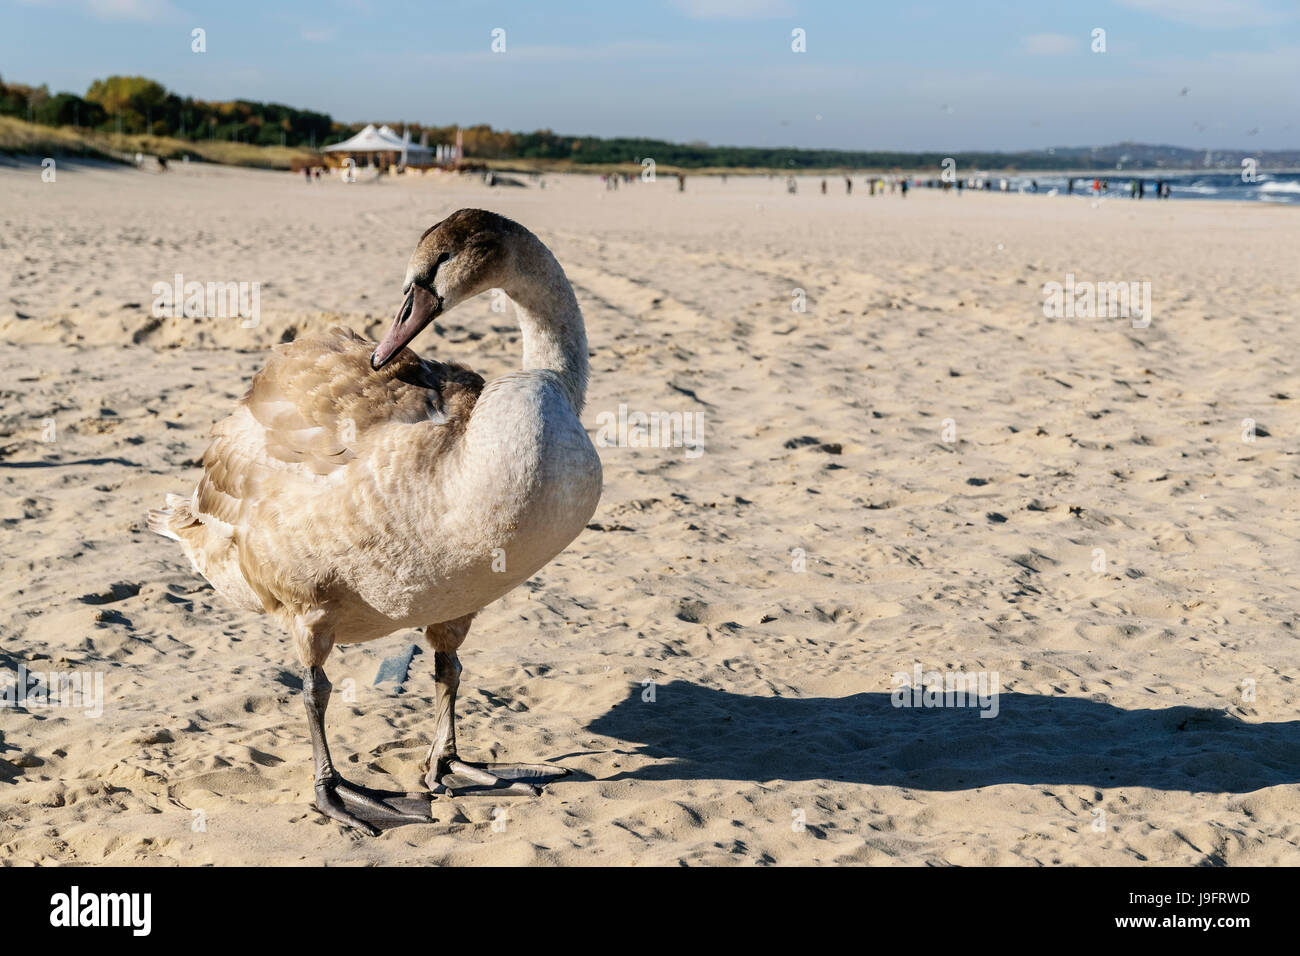 Swan on the beach, Baltic Sea, Swinoujscie, Poland Stock Photo